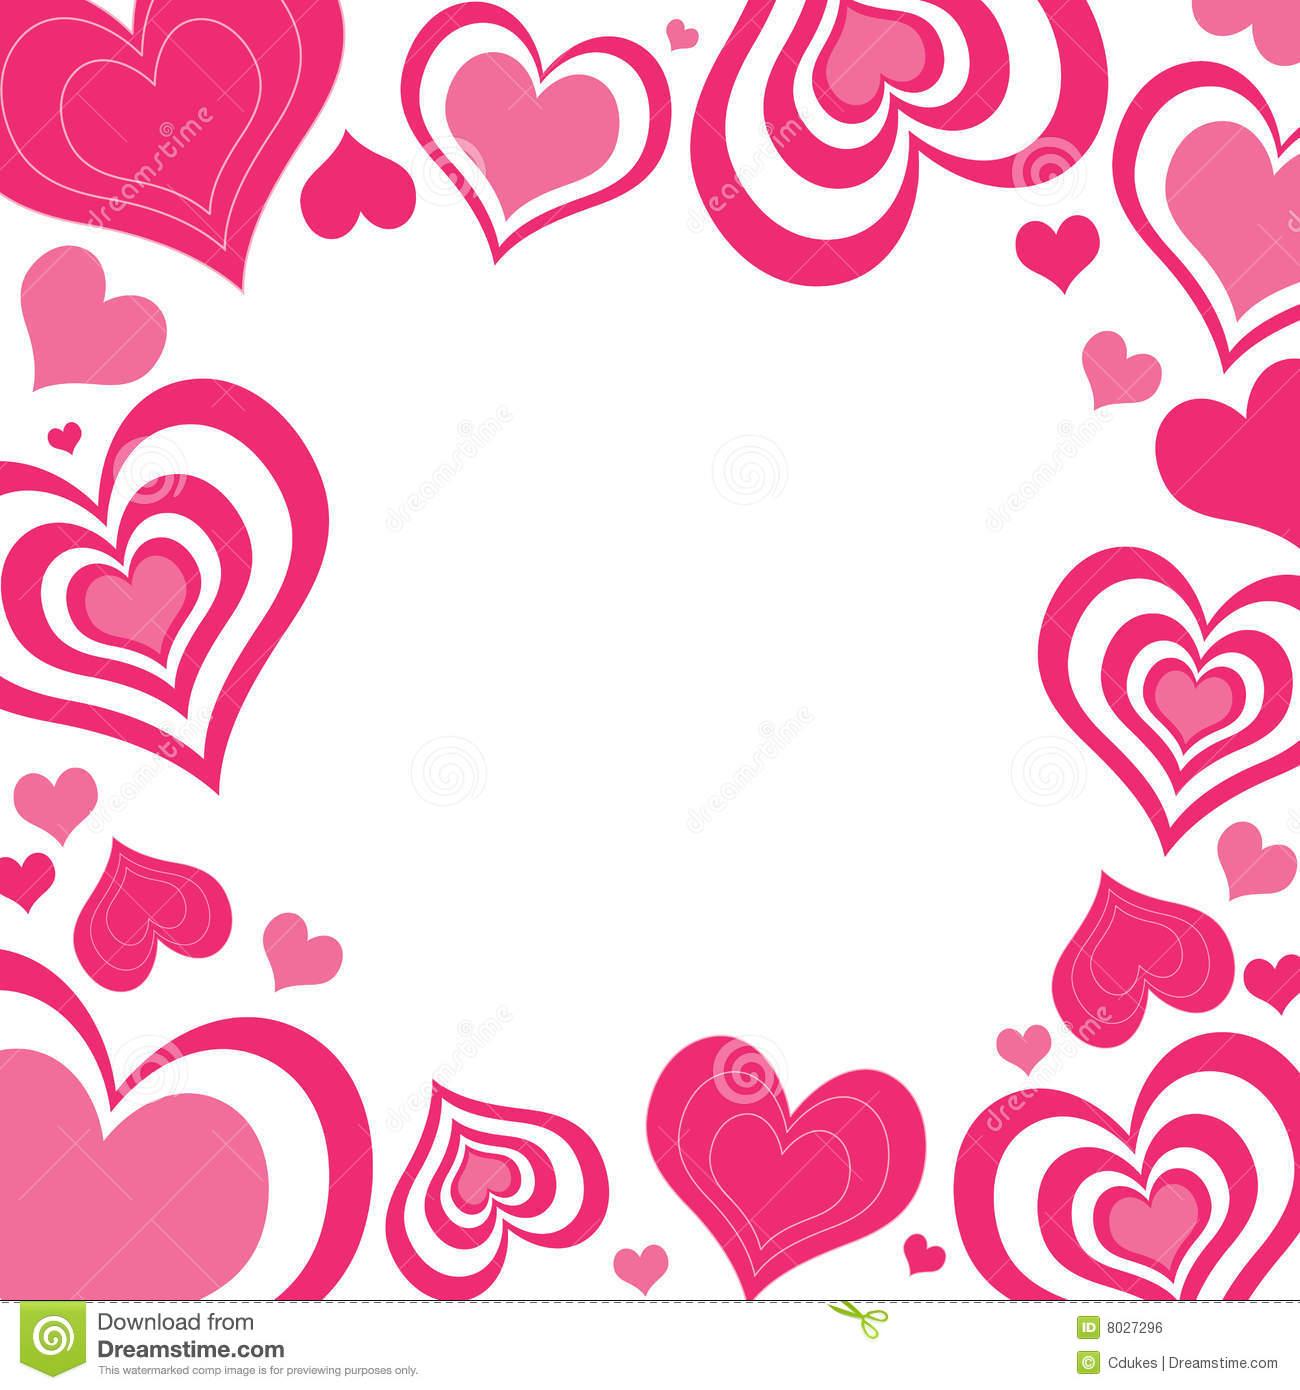 1300x1390 Valentine Border Clip Art Valentine Hearts Border Royalty Free